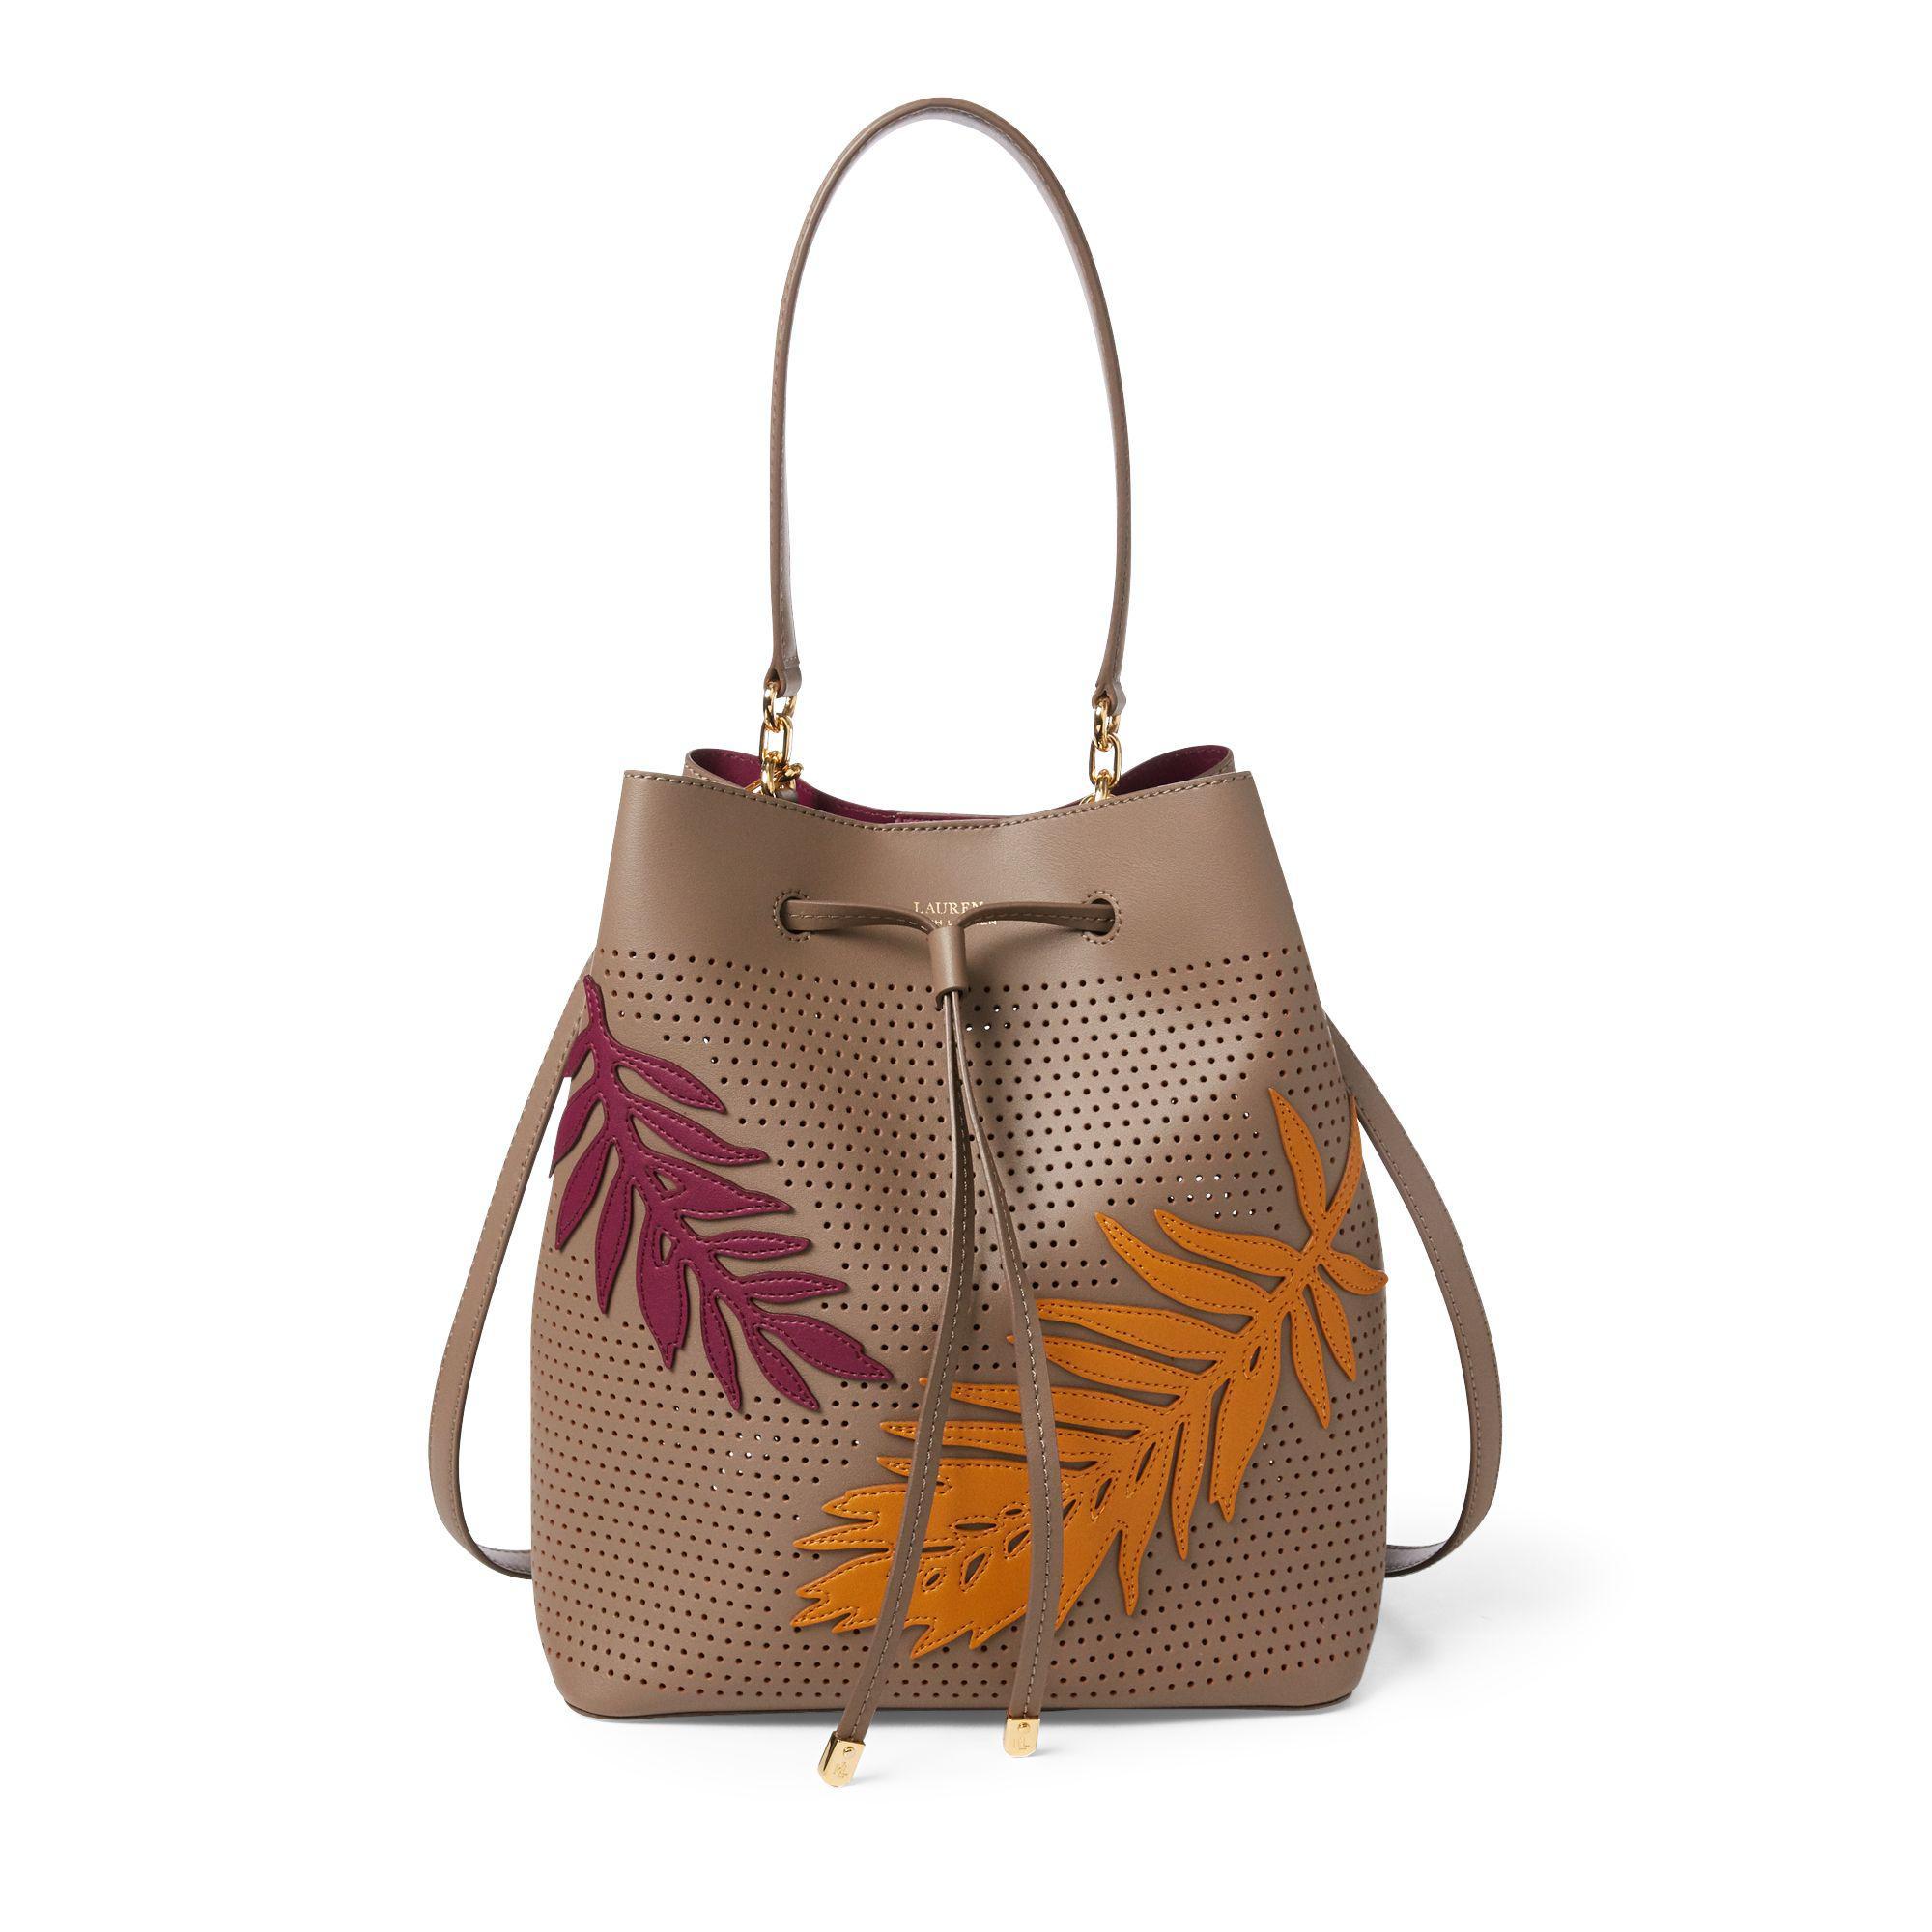 7ae9b1d829c47 Ralph Lauren Leaf Debby Drawstring Bag in Brown - Lyst